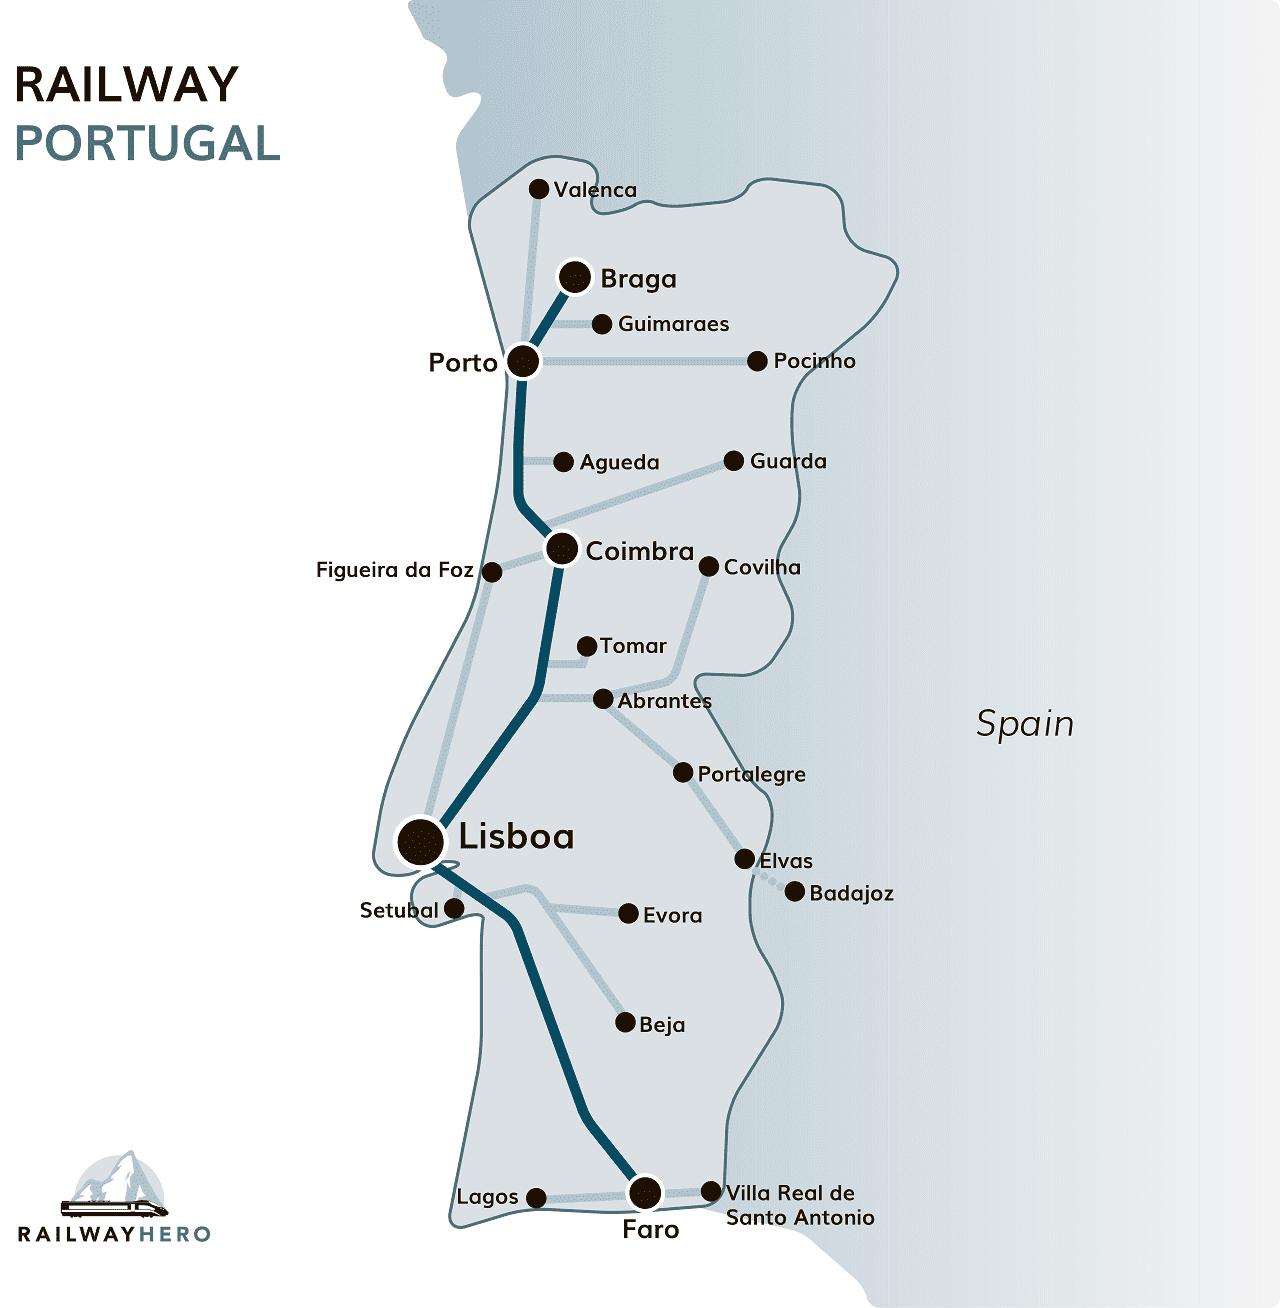 Portugal rail map